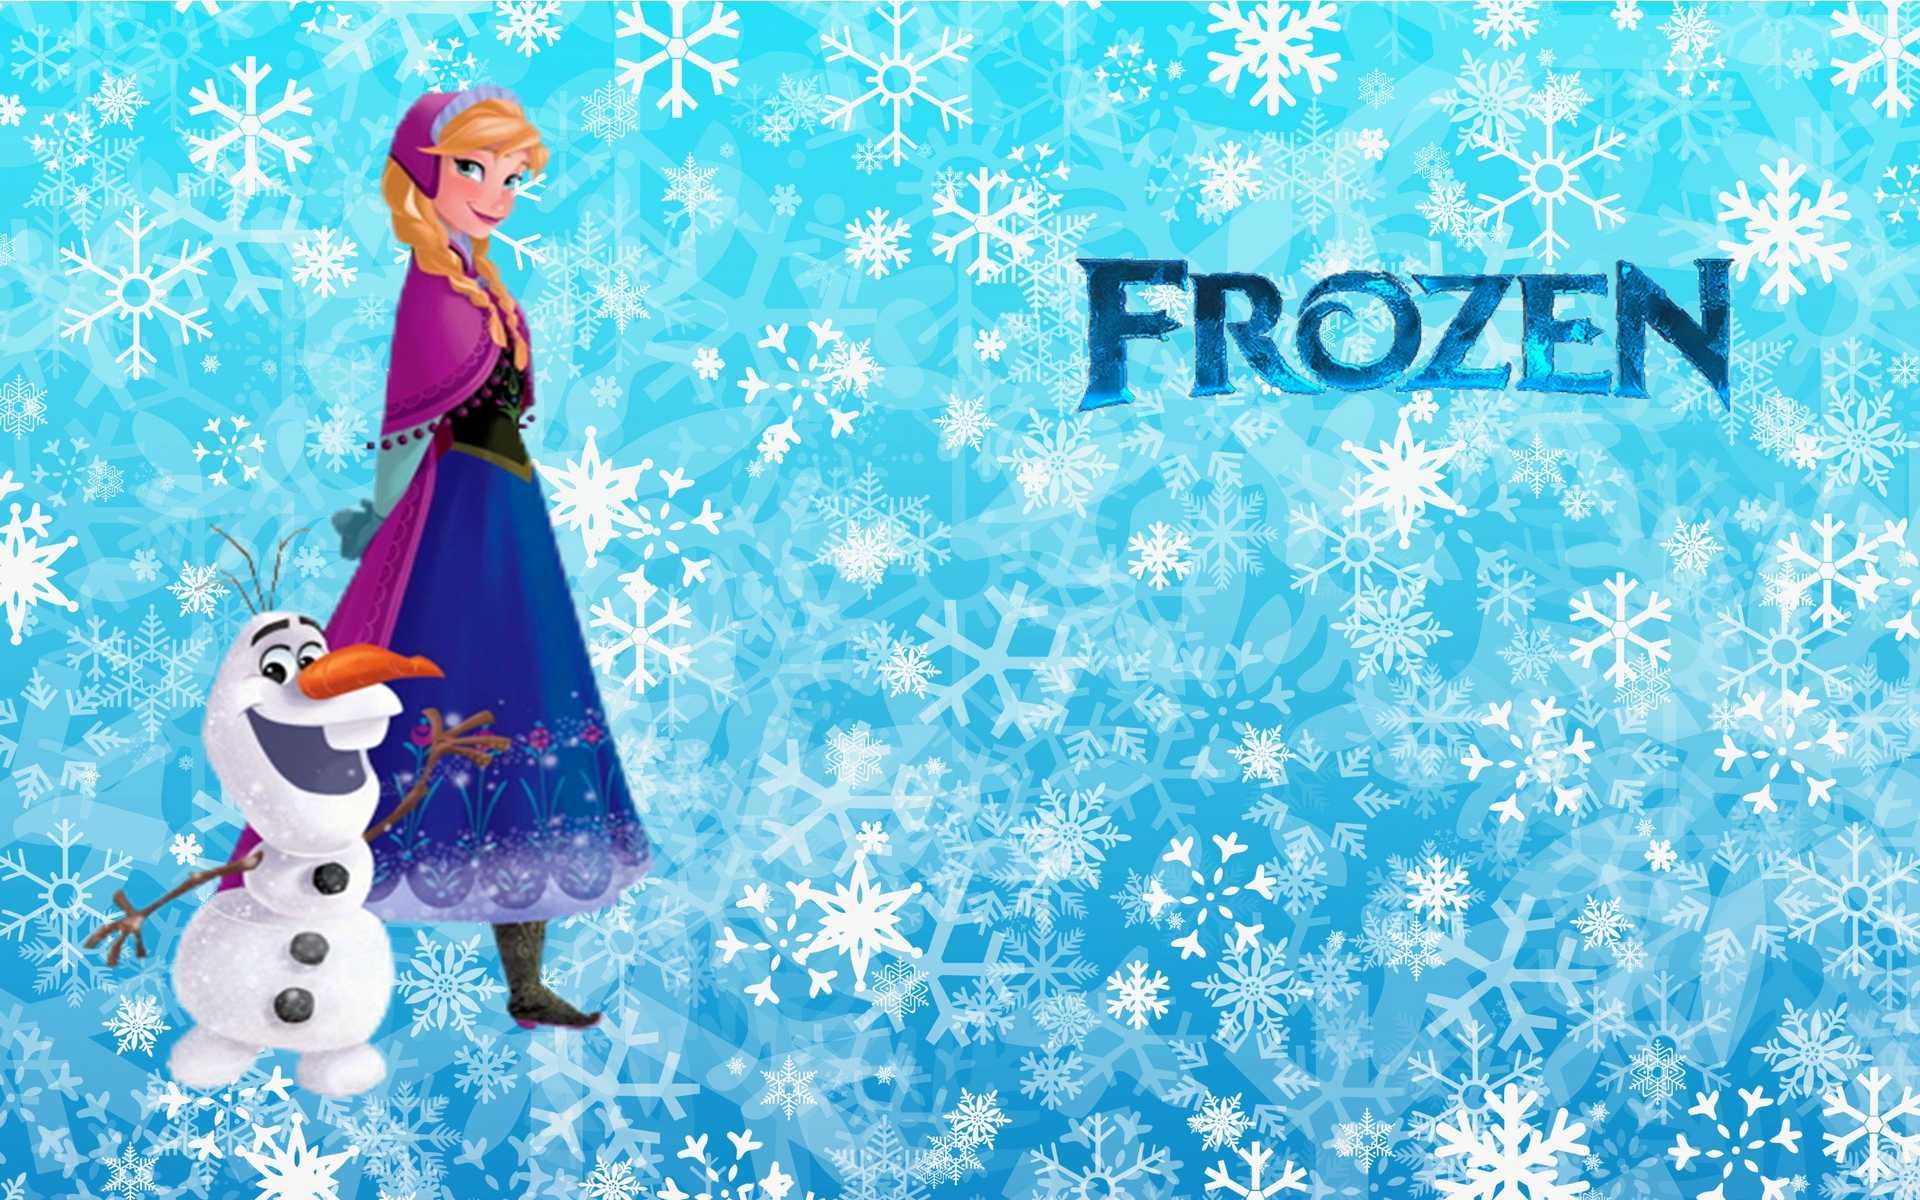 310 <b>Frozen HD</b> Wallpapers | Backgrounds - Wallpaper Abyss